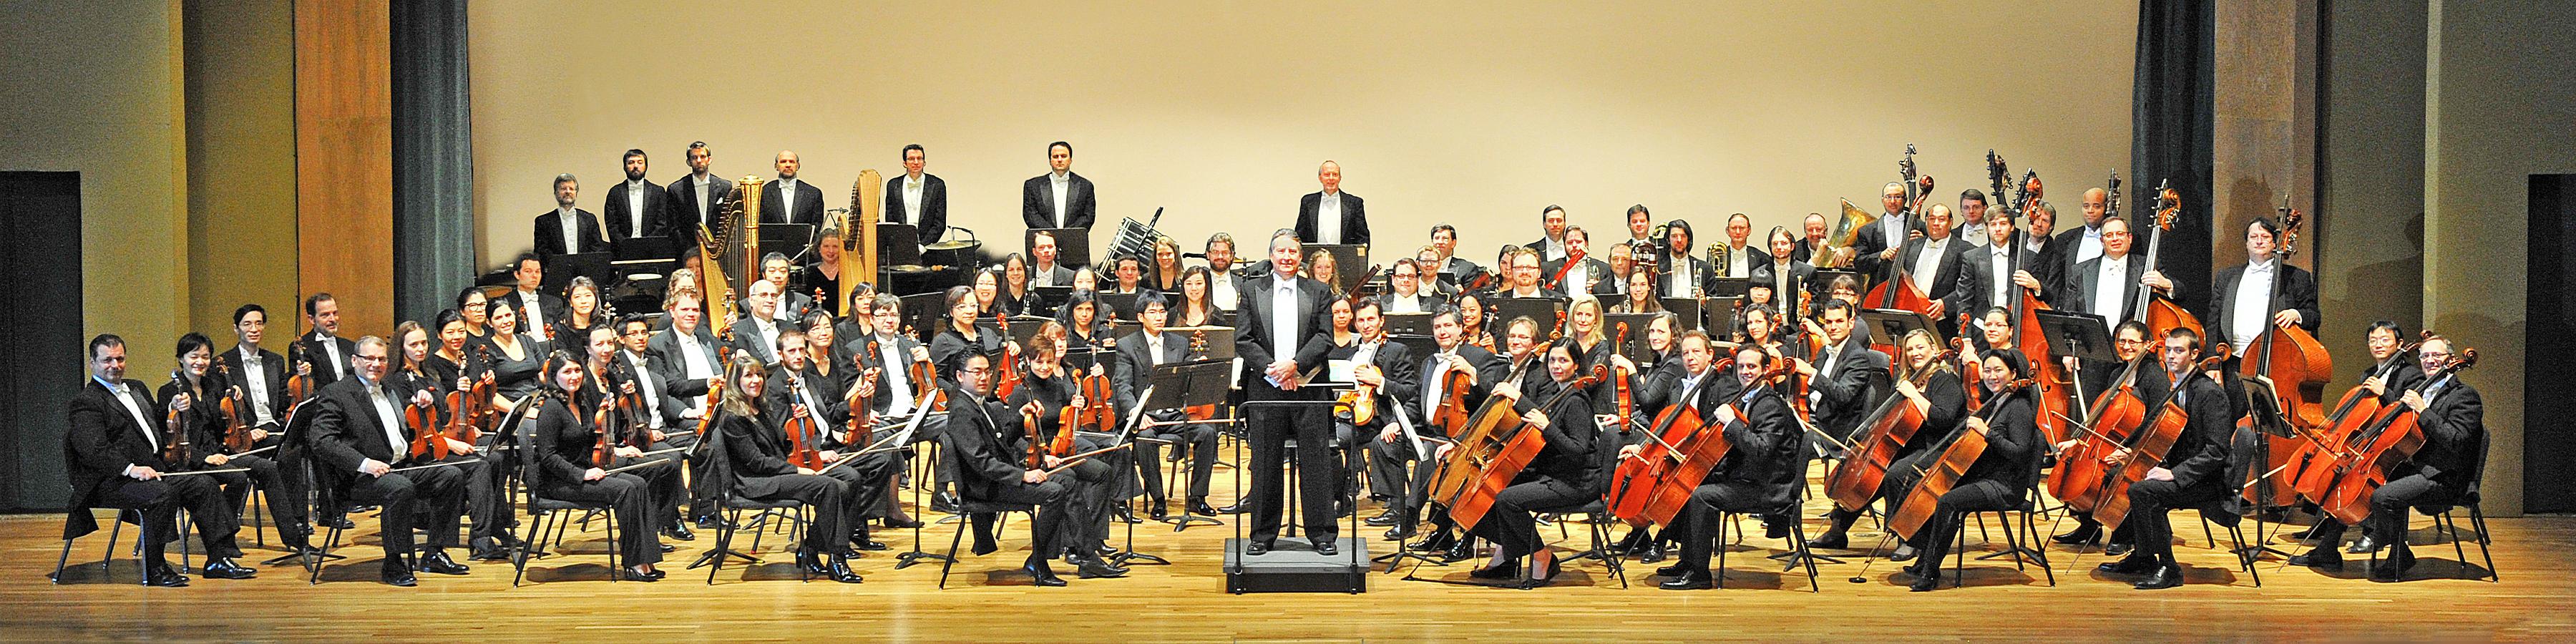 Symphony Arlington Full Orchestra